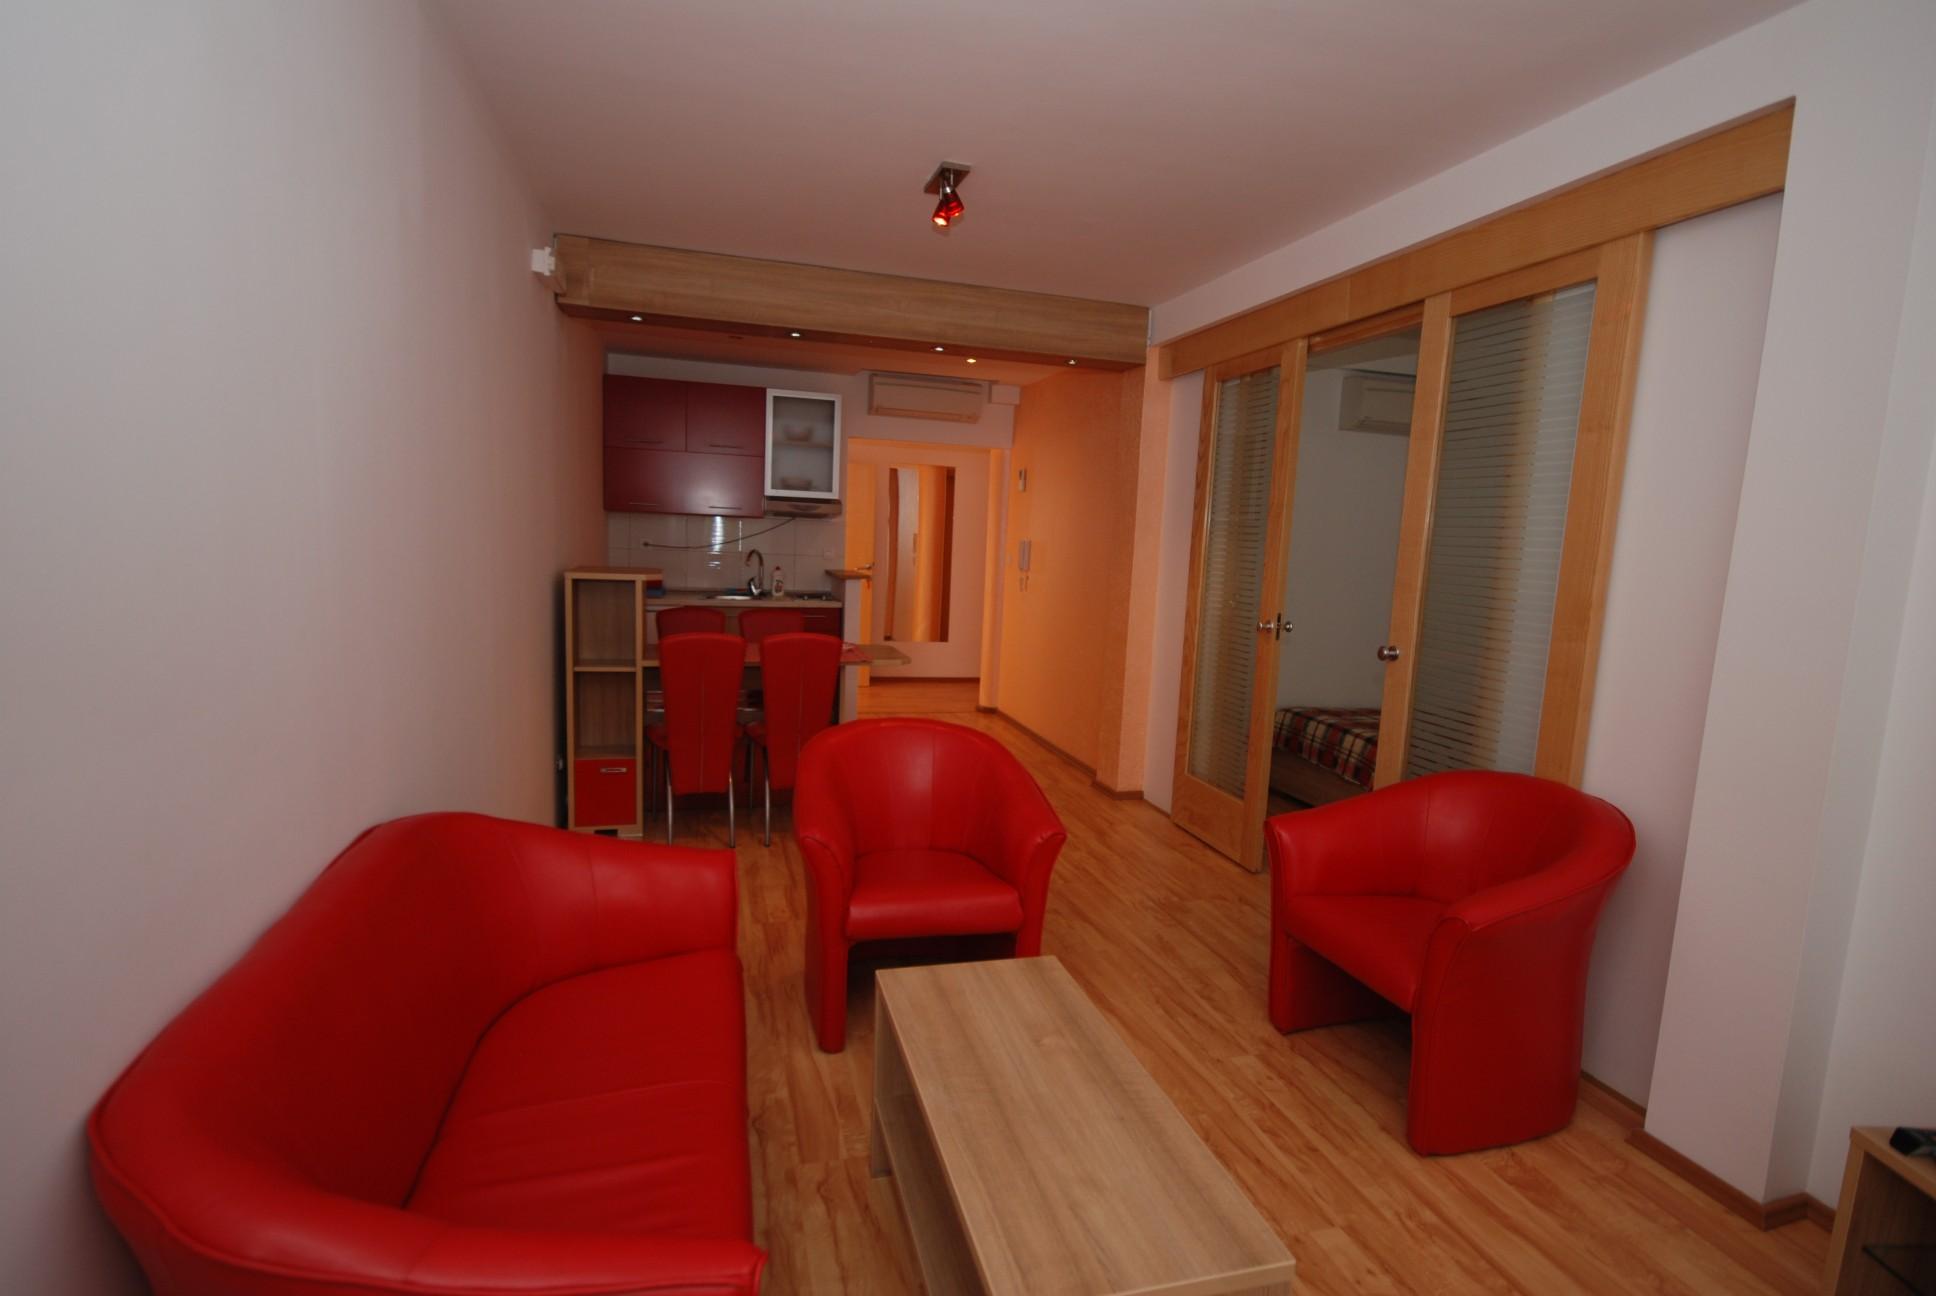 Red apartment livingroom Springs apartments Montenegro